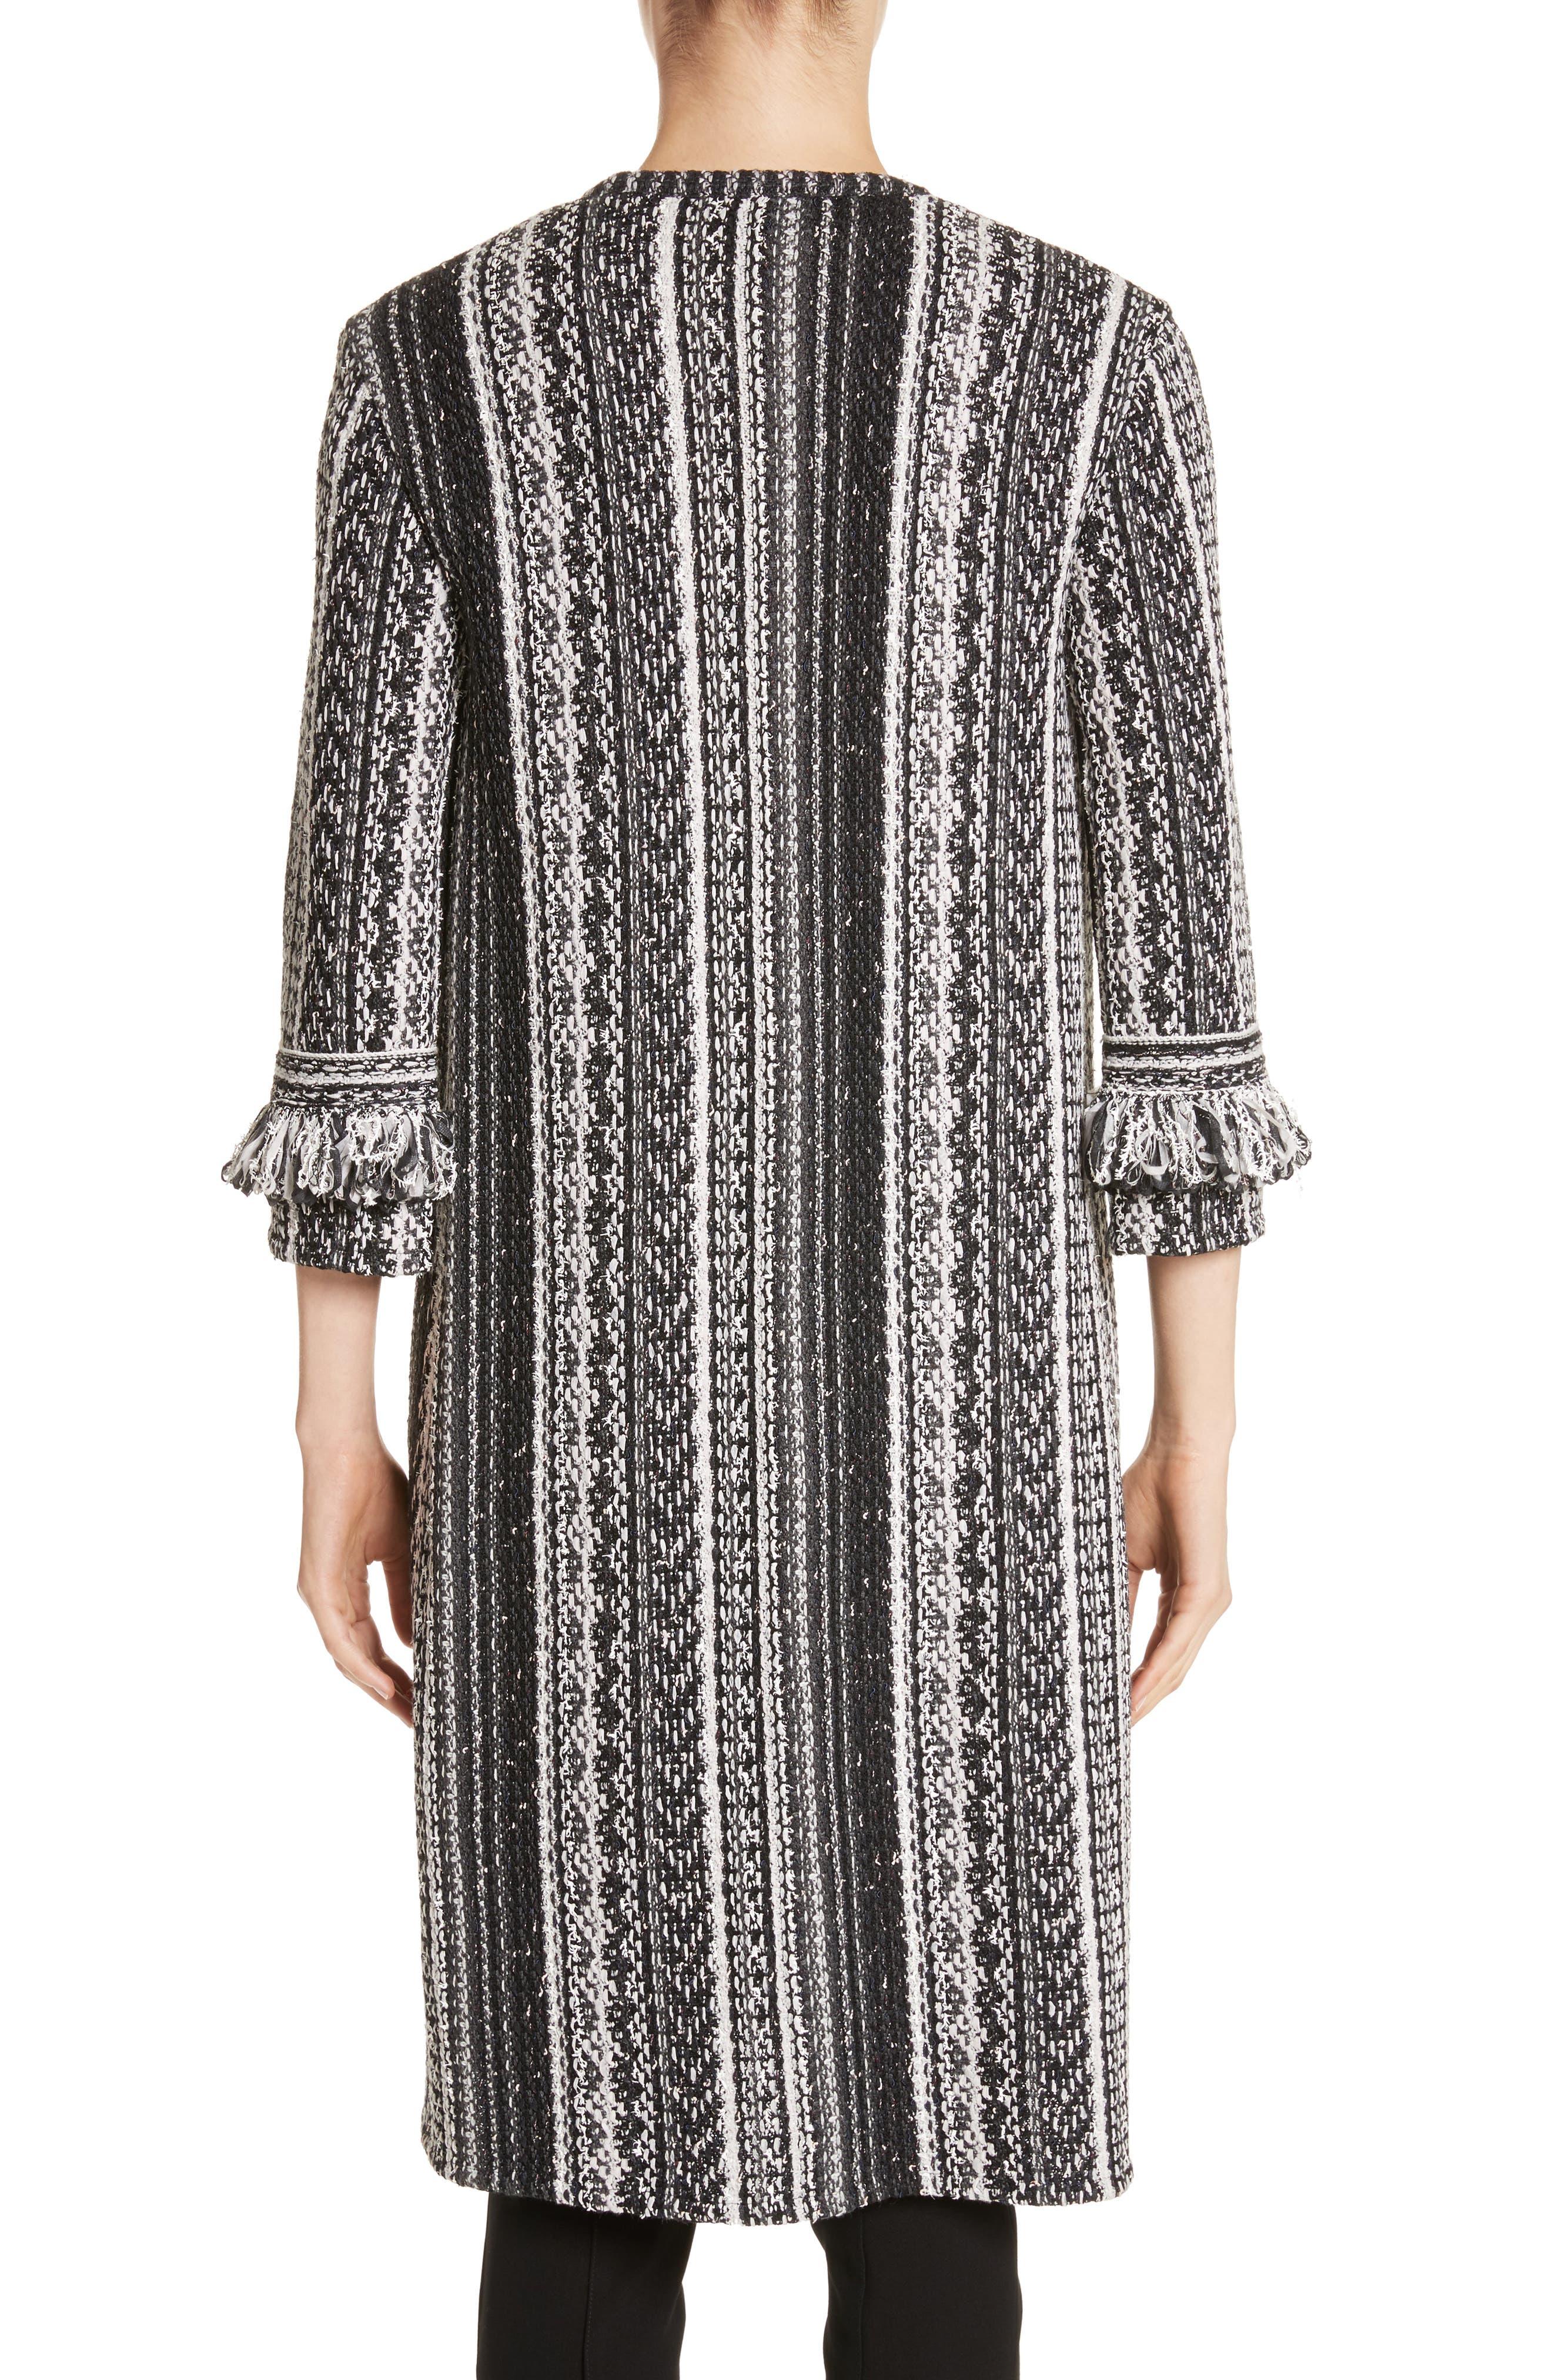 Fringe Ombré Stripe Tweed Knit Jacket,                             Alternate thumbnail 2, color,                             Caviar Multi